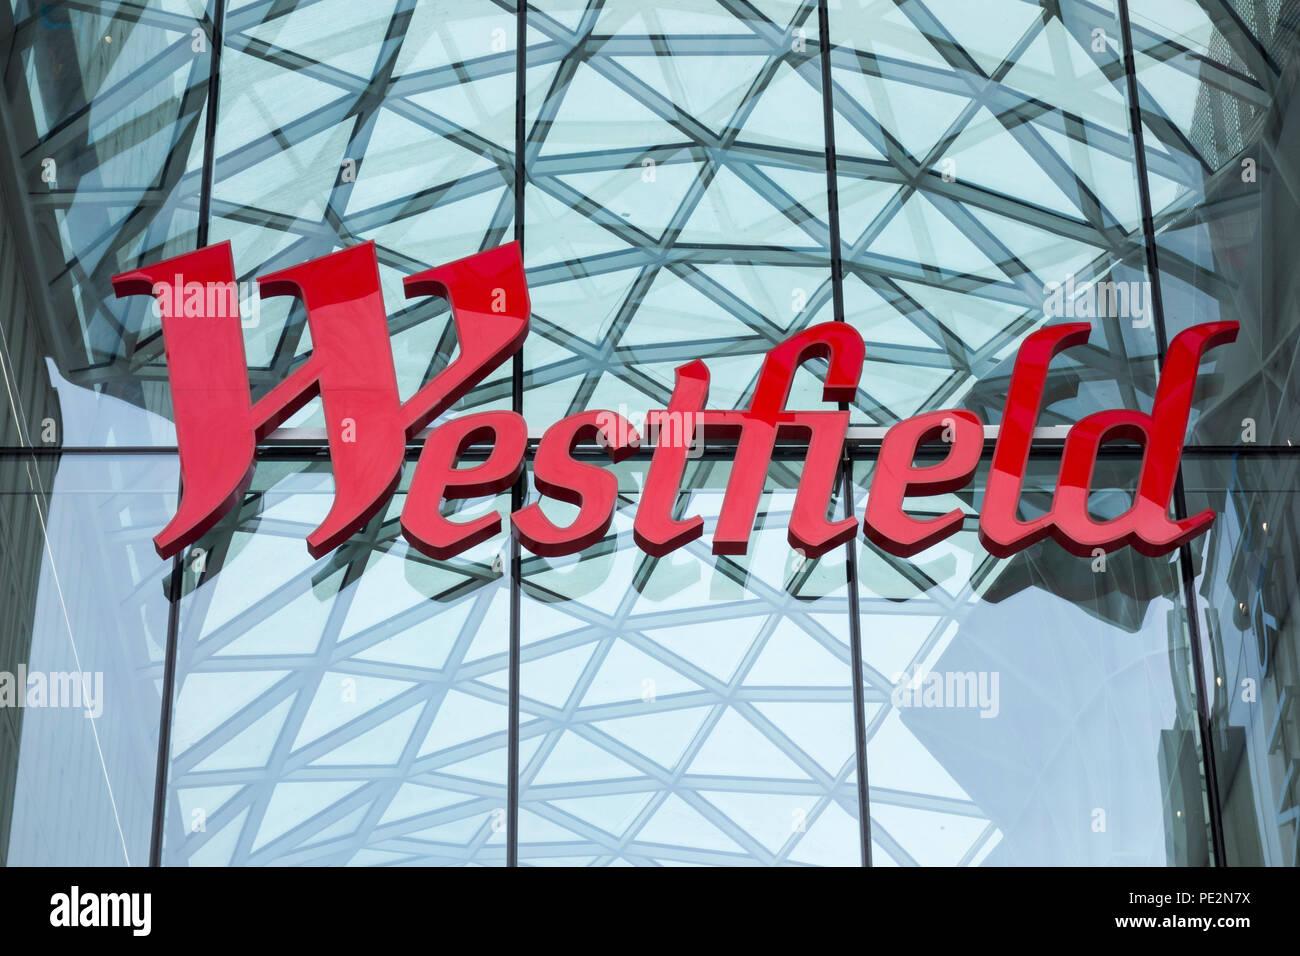 Westfield Shopping Centre, Ariel Way, White City, London, W12, UK - Stock Image